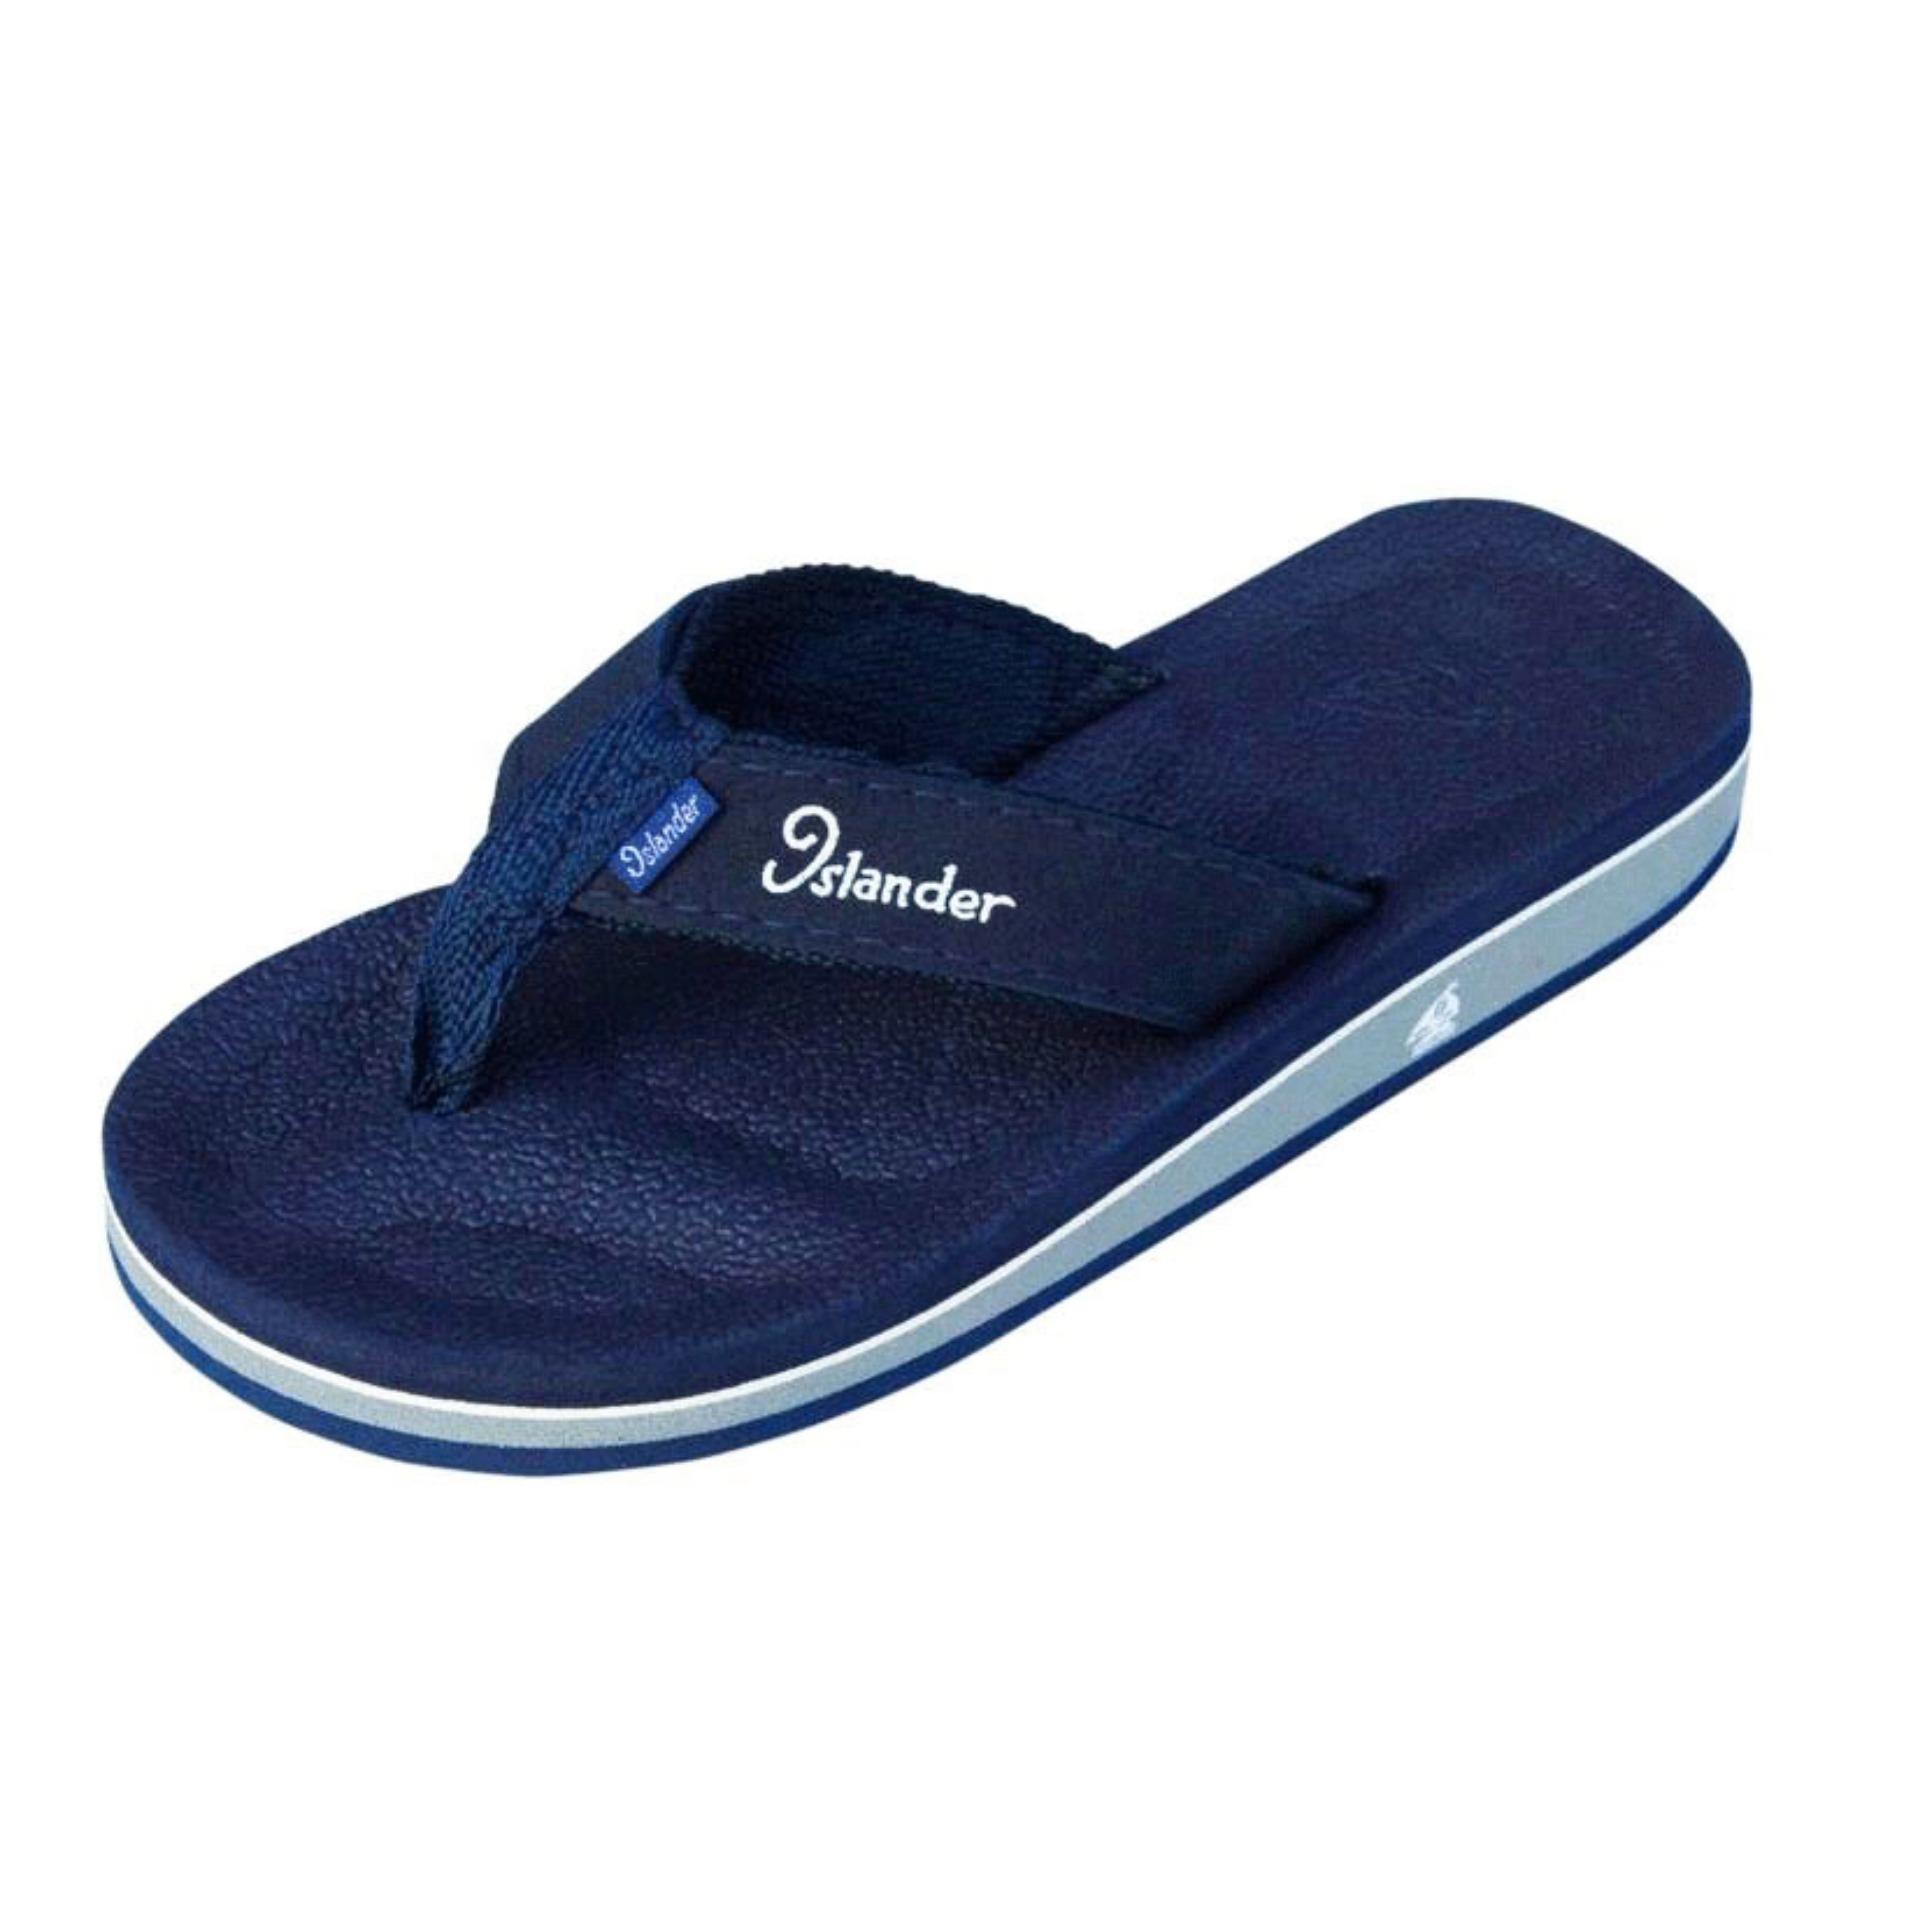 05a115b44e1 Islander Philippines  Islander price list - Slippers for Men for ...